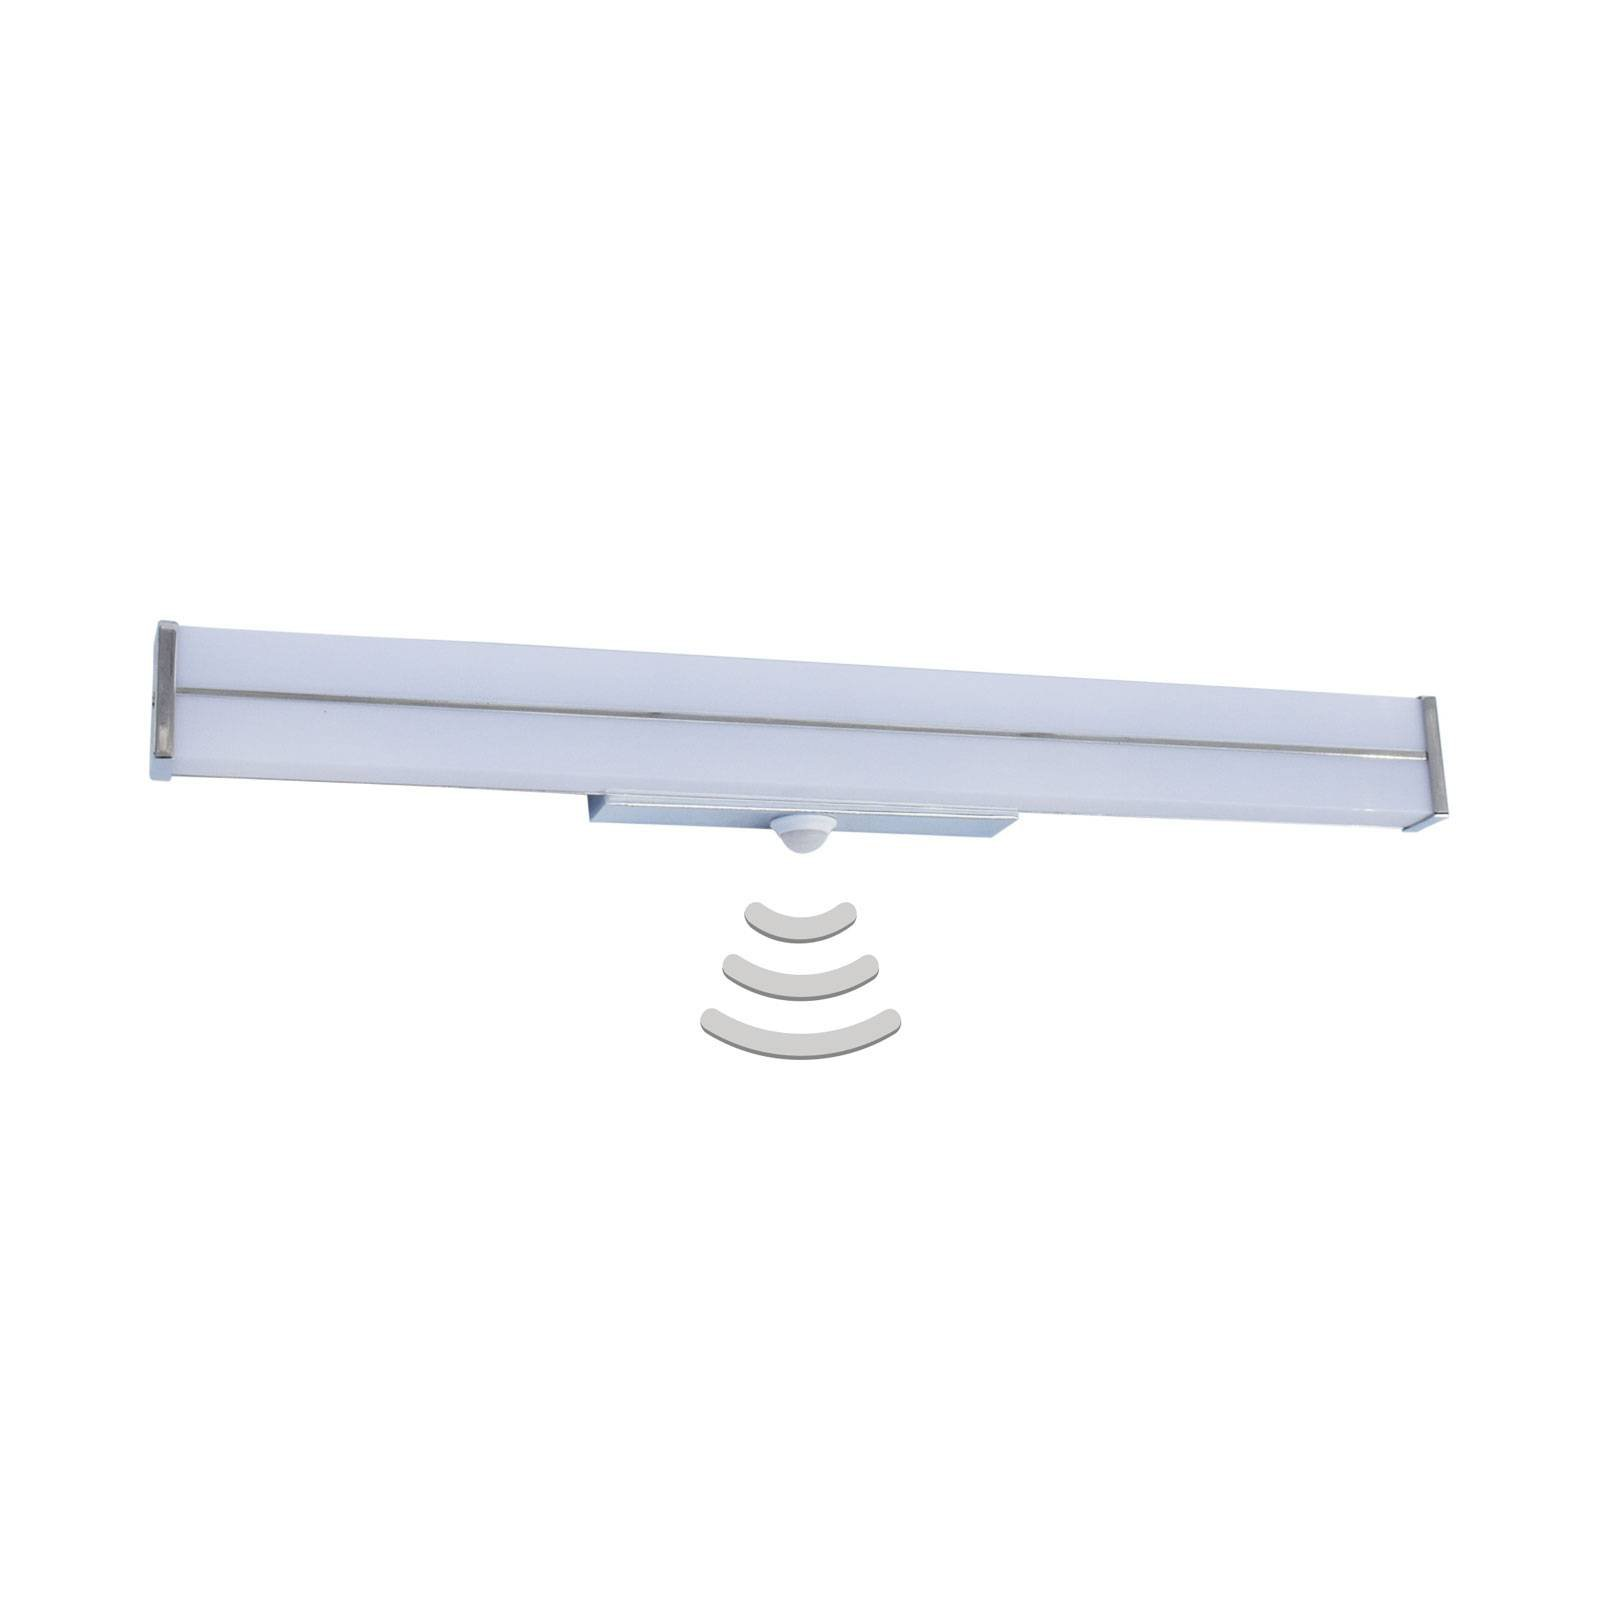 LED-speillampe Sparky, sensorbryter, 40 cm